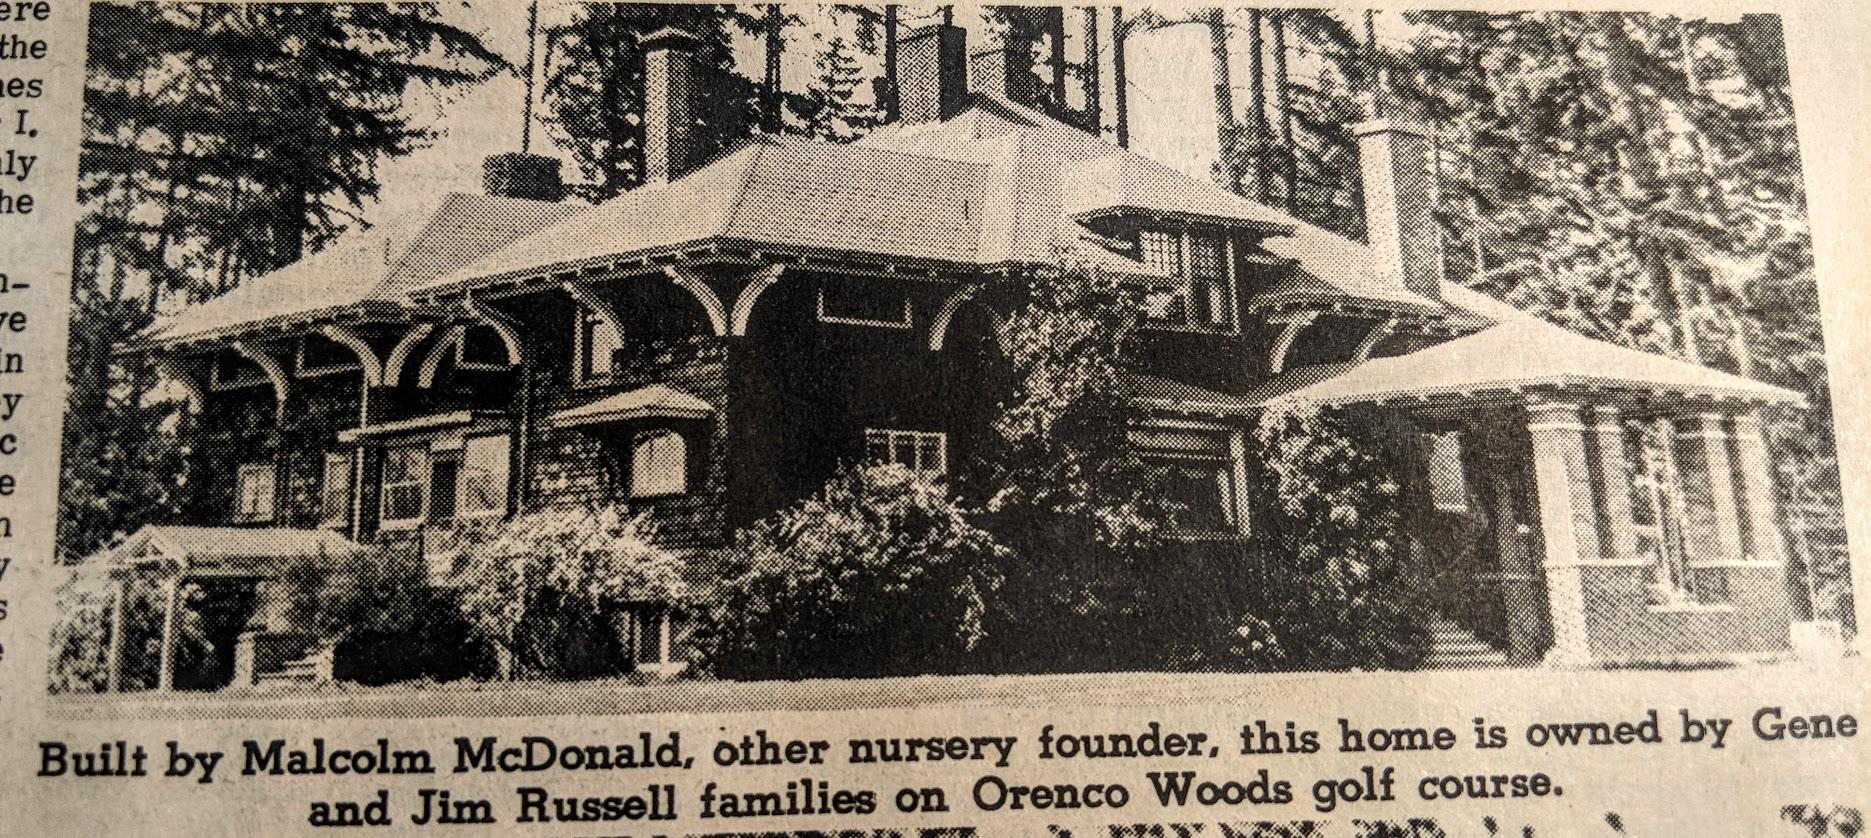 McDonald House - Copy.jpg